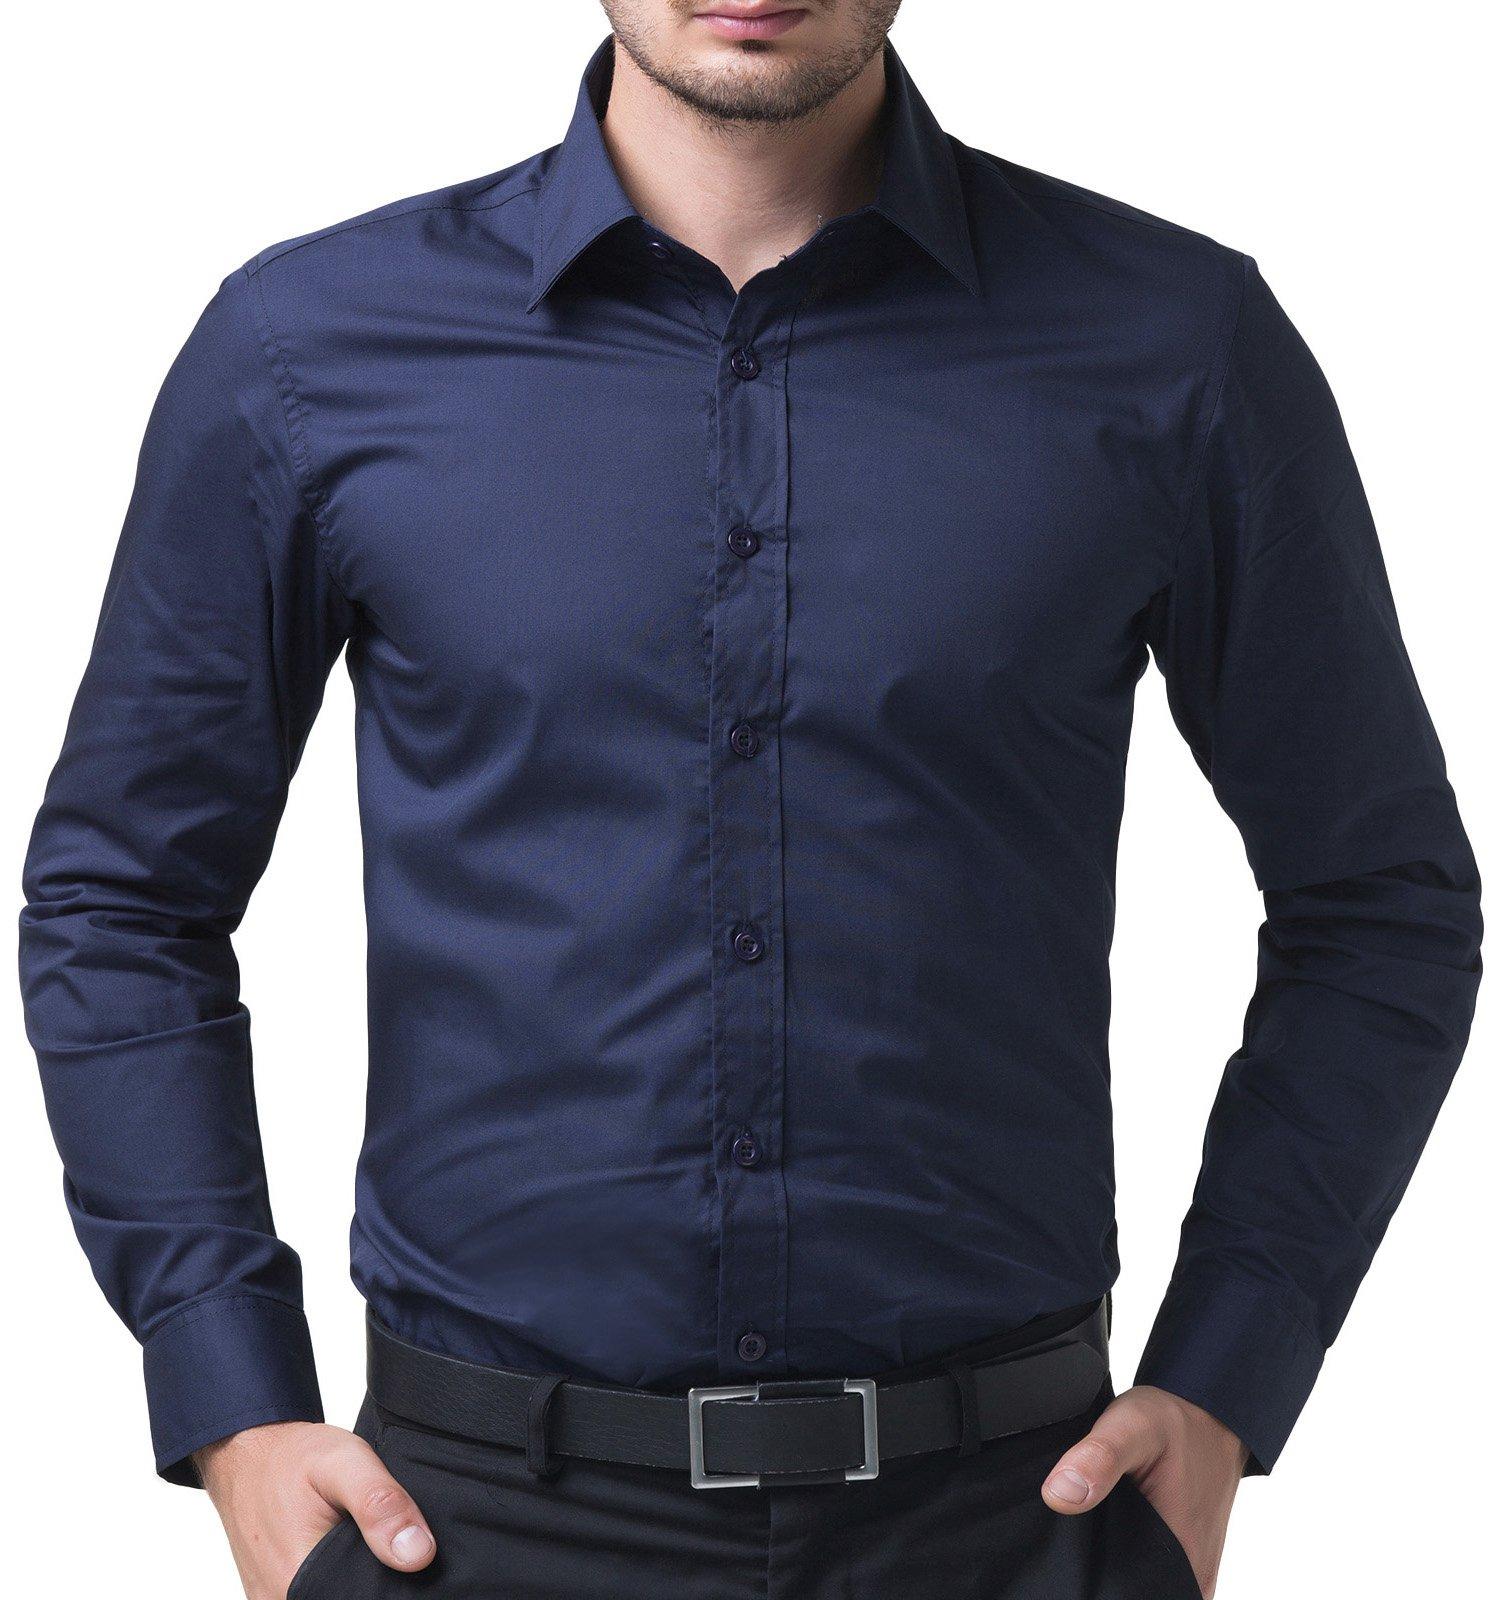 Mens Navy Blue Dress Shirt: Amazon.com